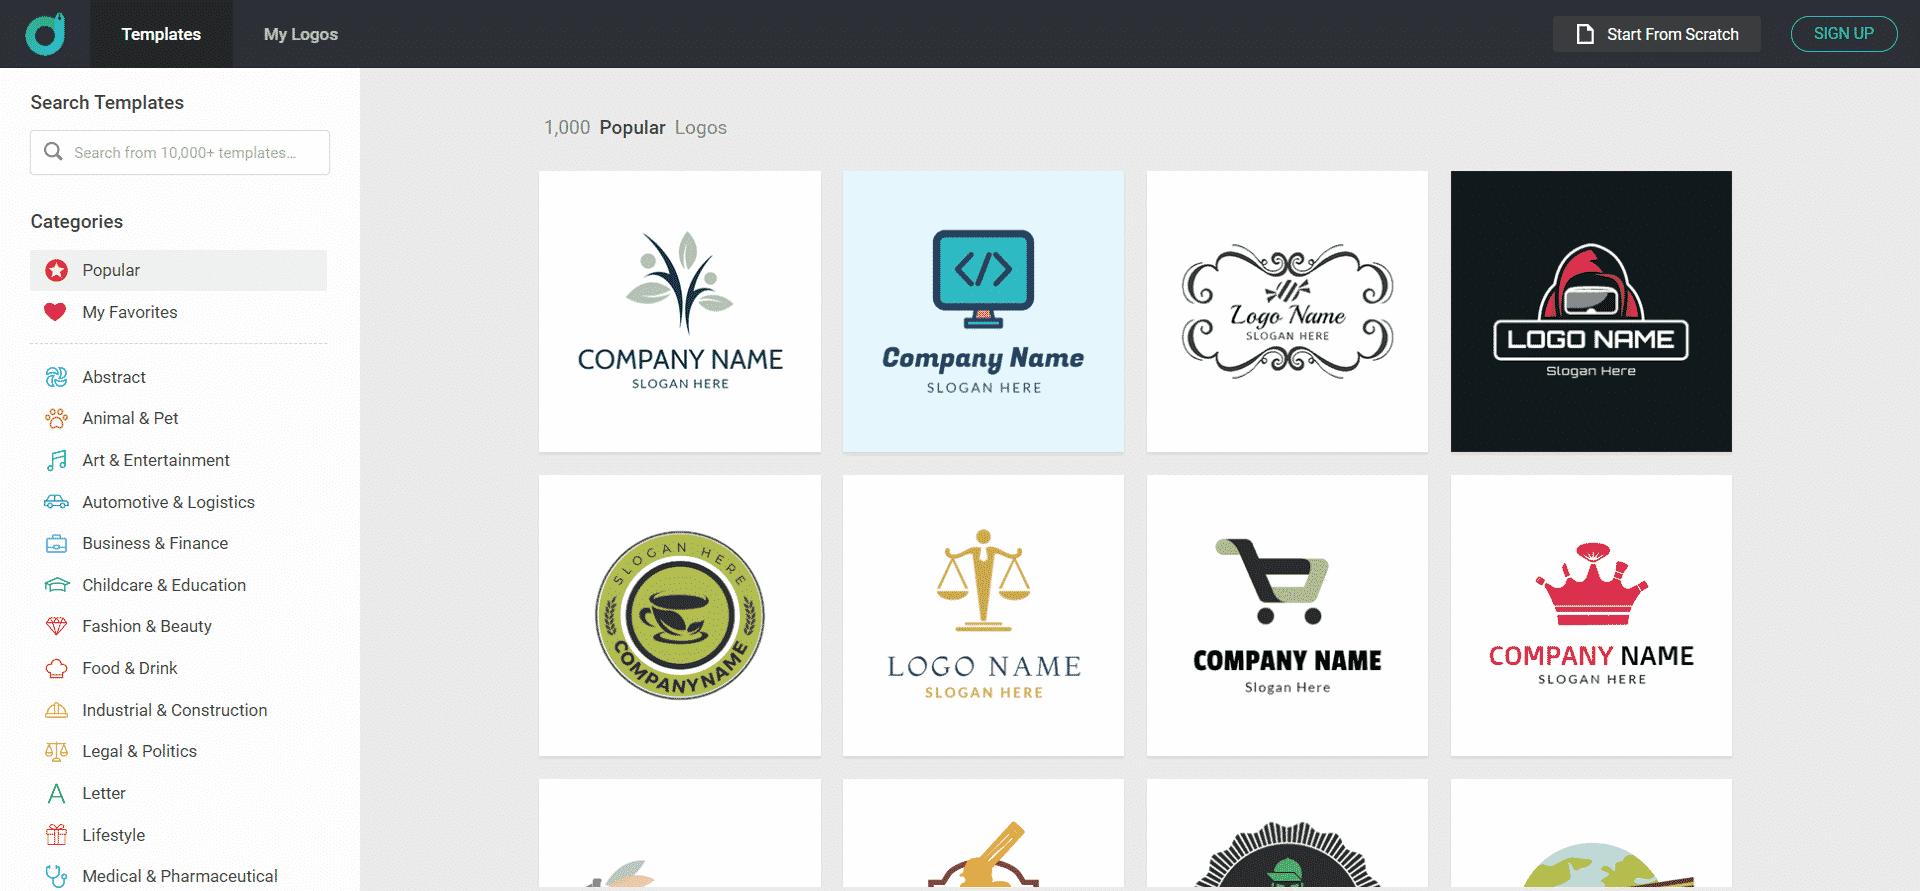 Choose A Template With DesignEvo